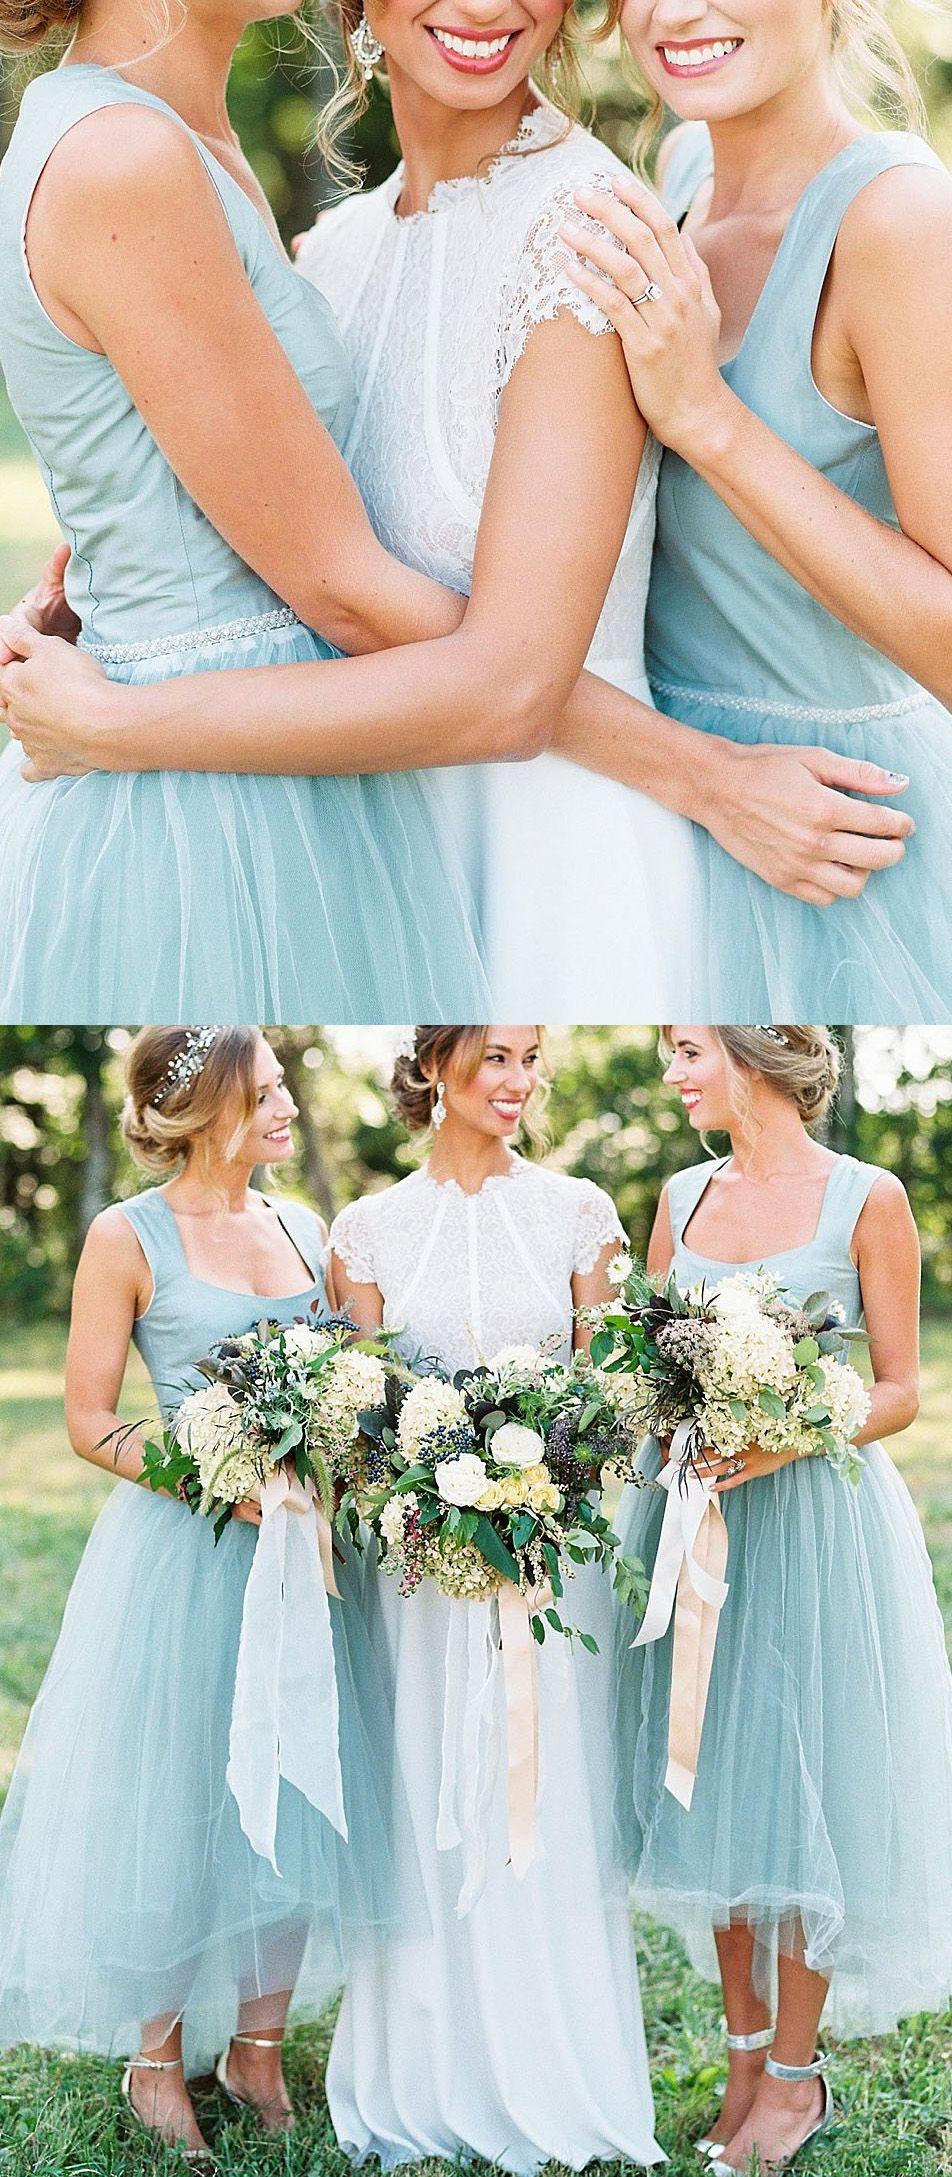 Custom made asymmetrical bridesmaid dress long light blue dresses blue bridesmaid dresses long bridesmaid dresses bridesmaid dresses blue light blue bridesmaid dresses ombrellifo Gallery